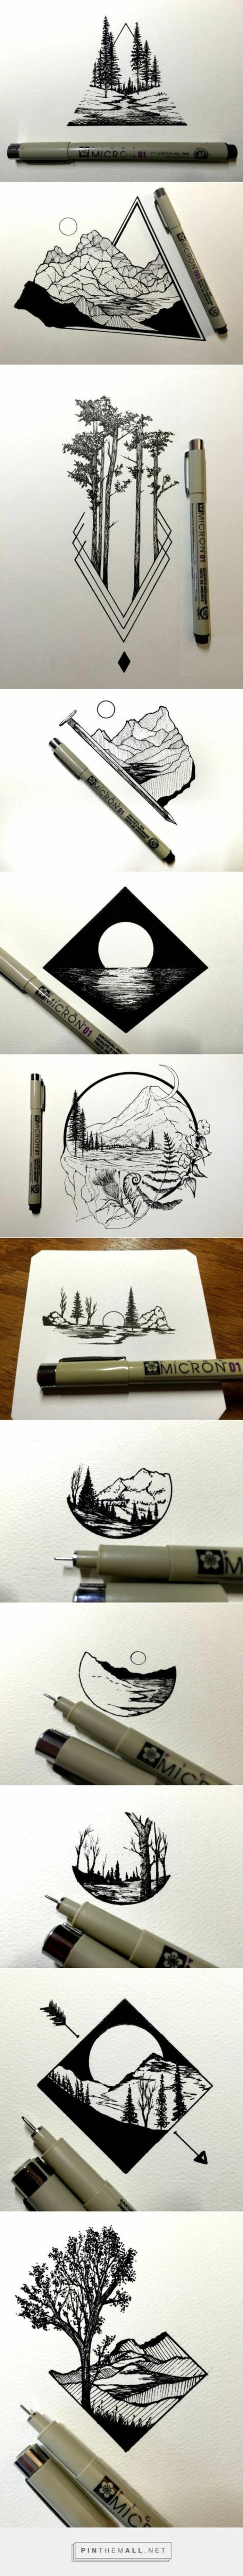 Model de dessin facile croquis au crayon dessin arbres dessins originaux